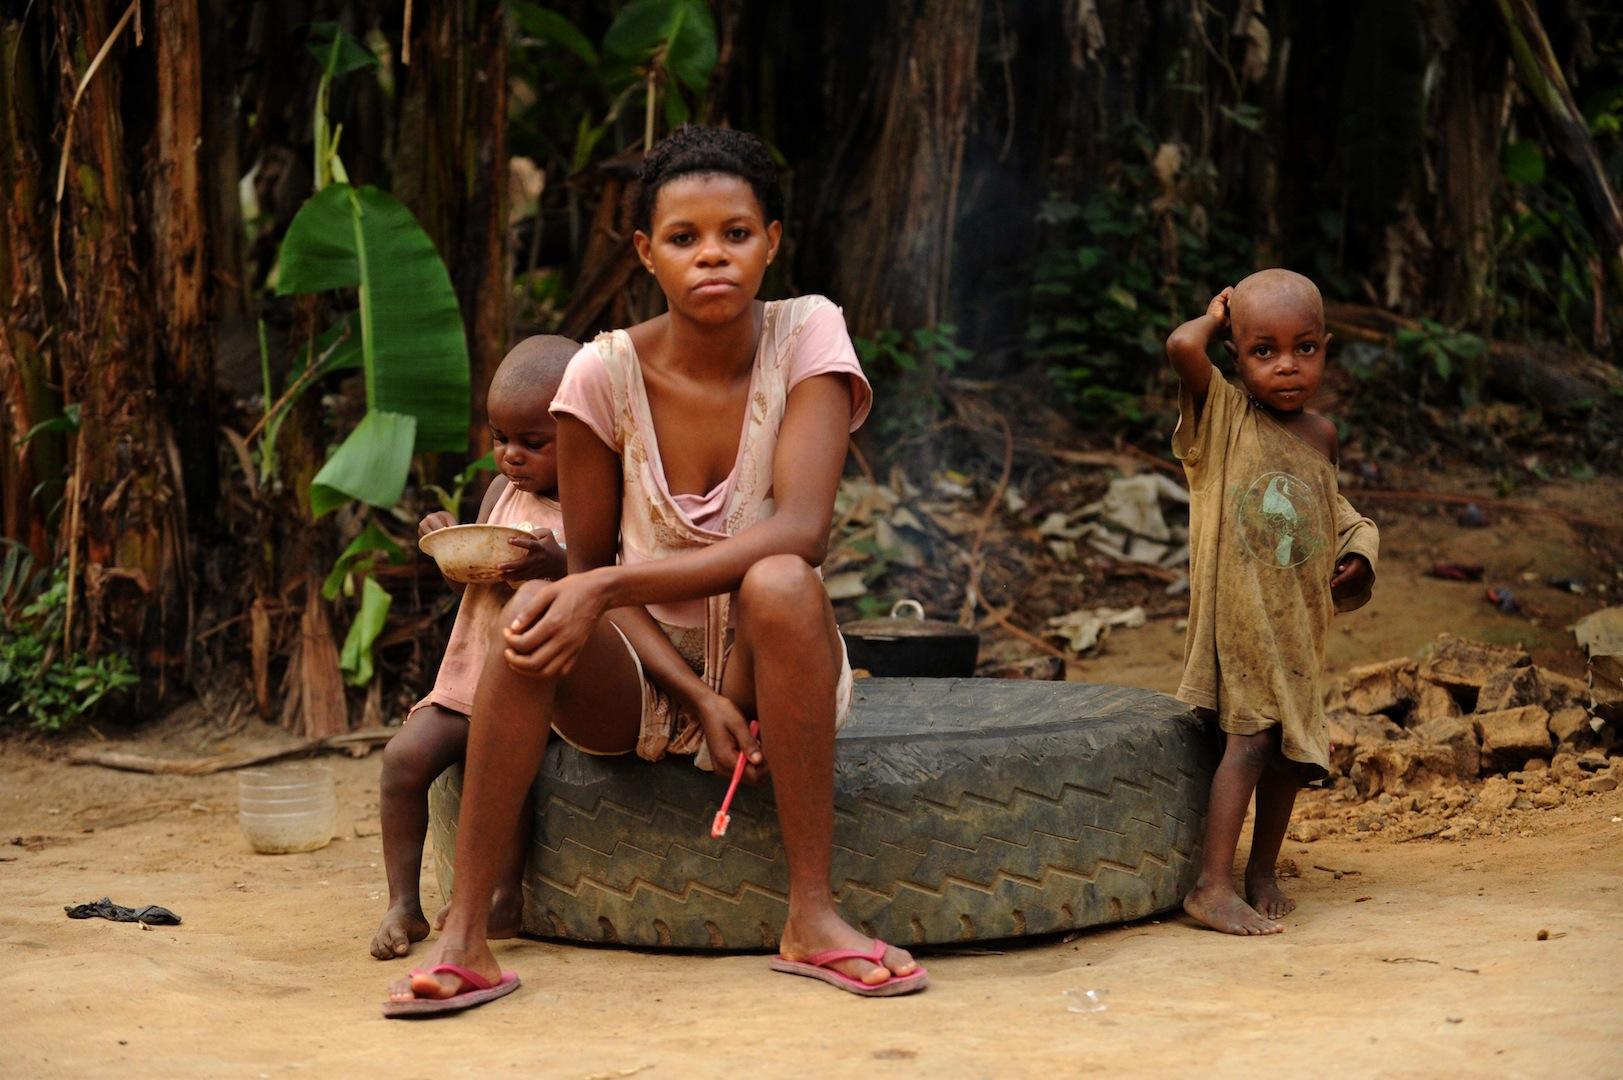 CAMEROON 035